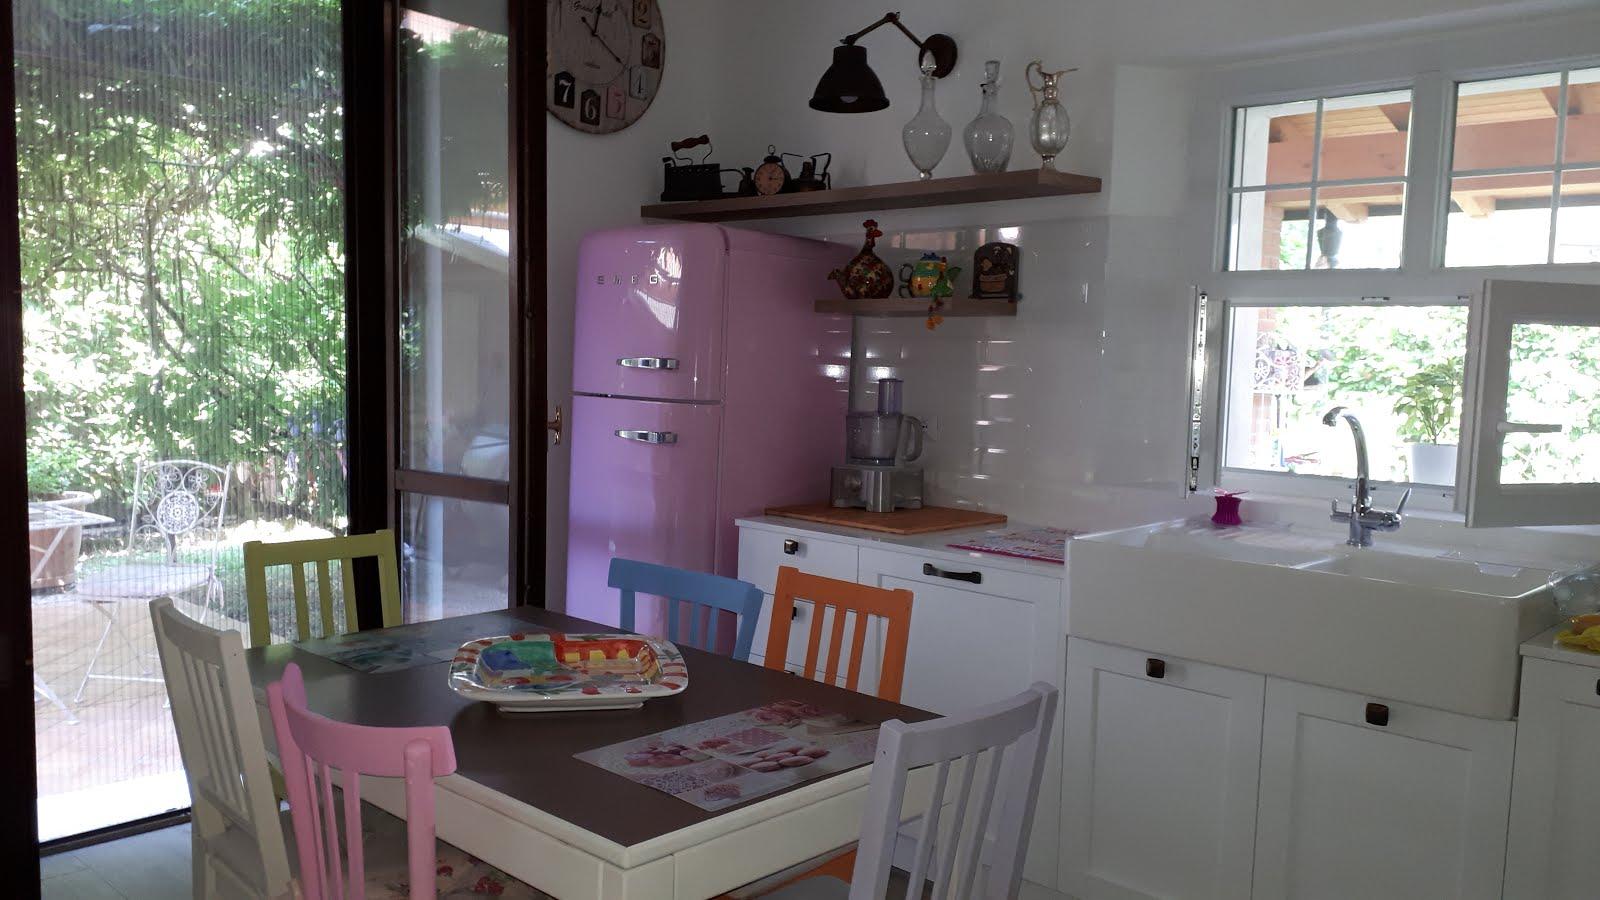 La mia cucina !!!